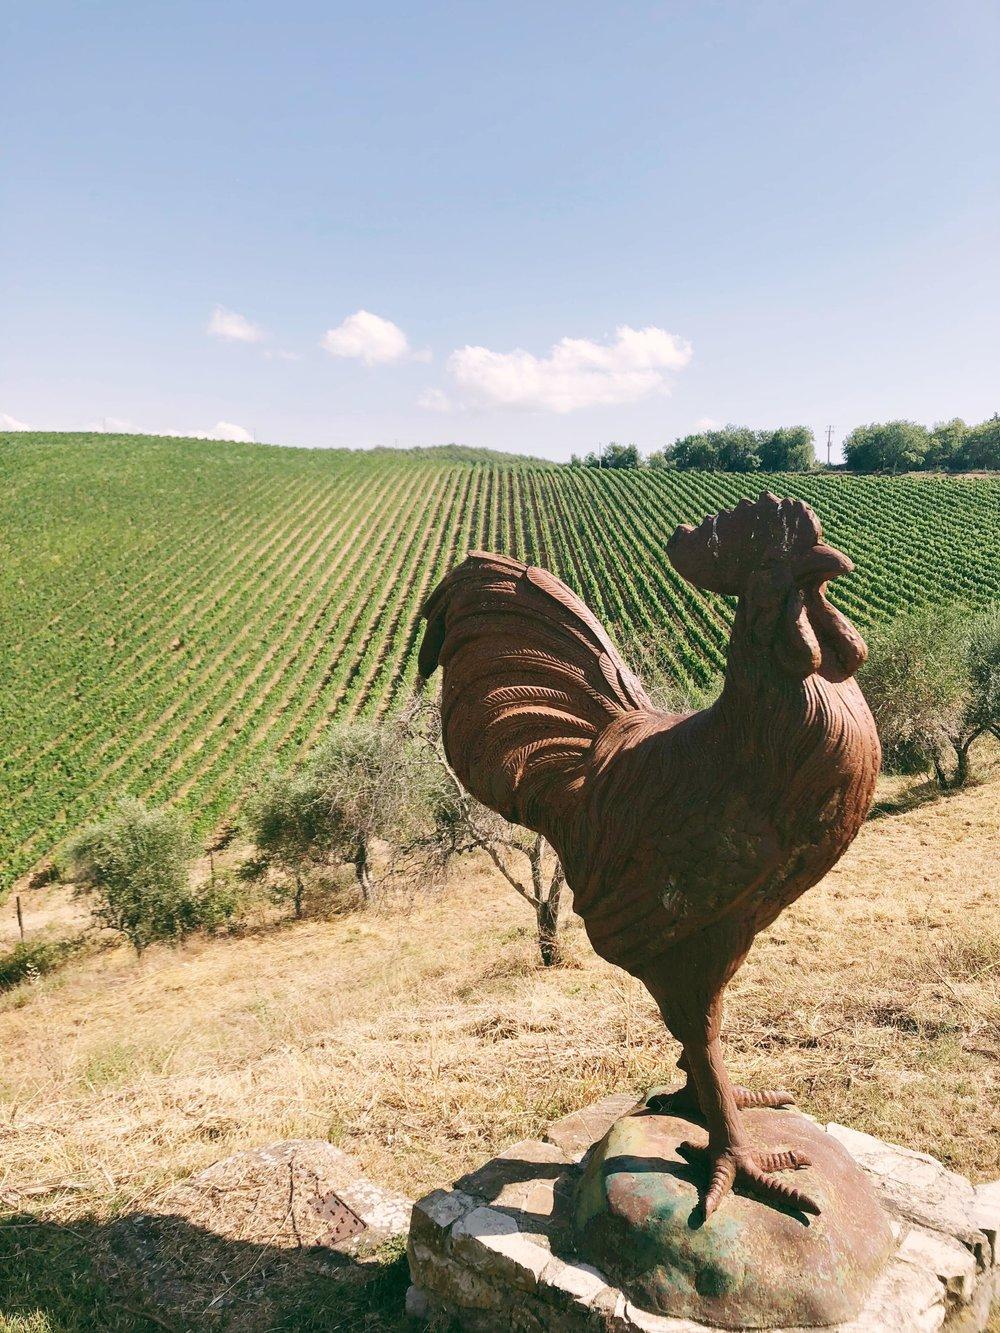 The Gallo Nero at one of our preferred wineries in Chianti!